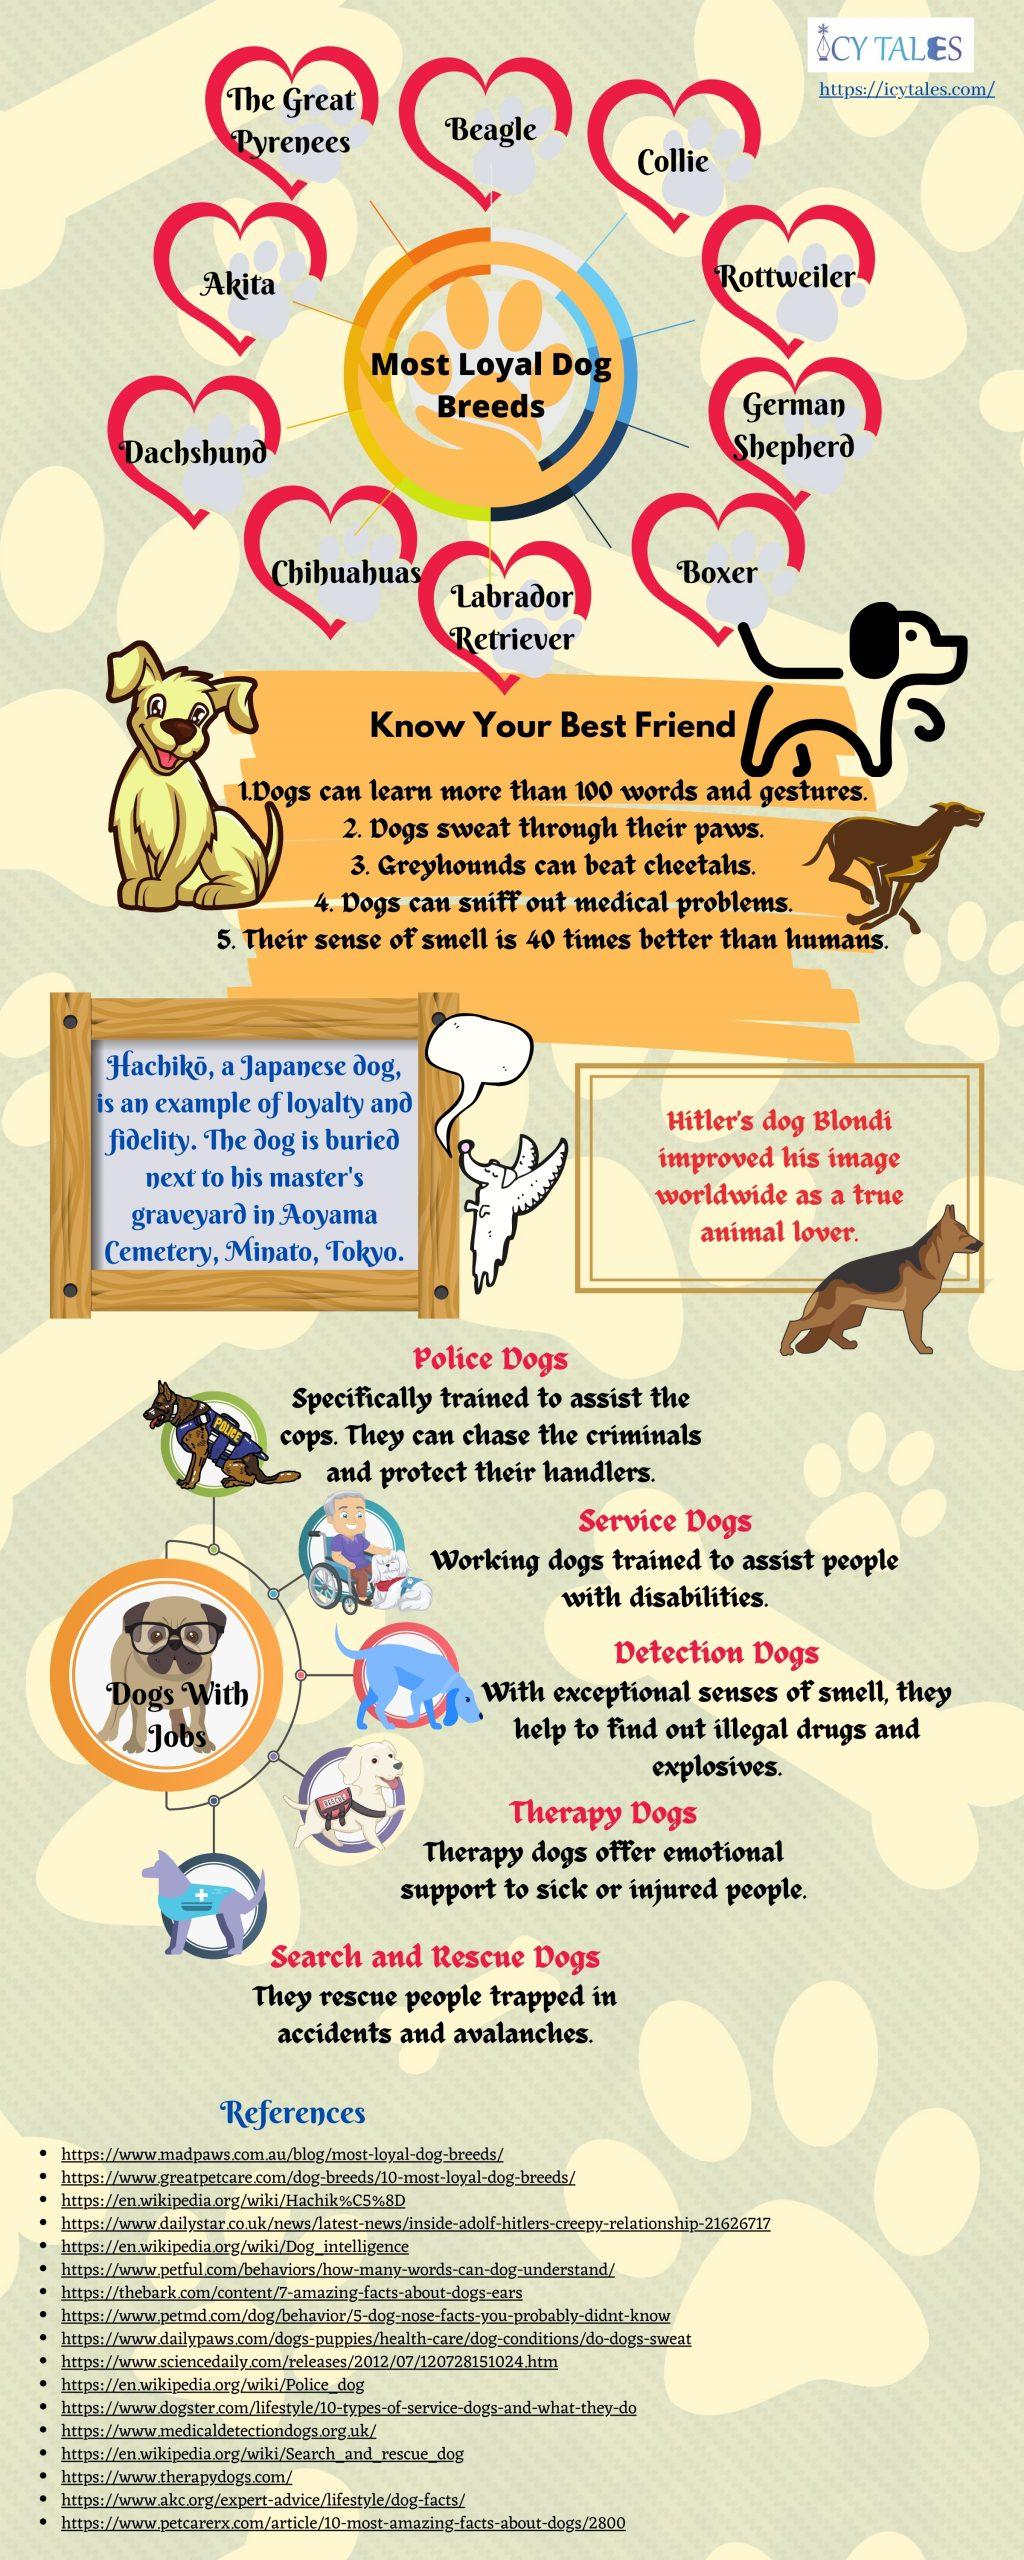 The Best Loyal Dog Breeds